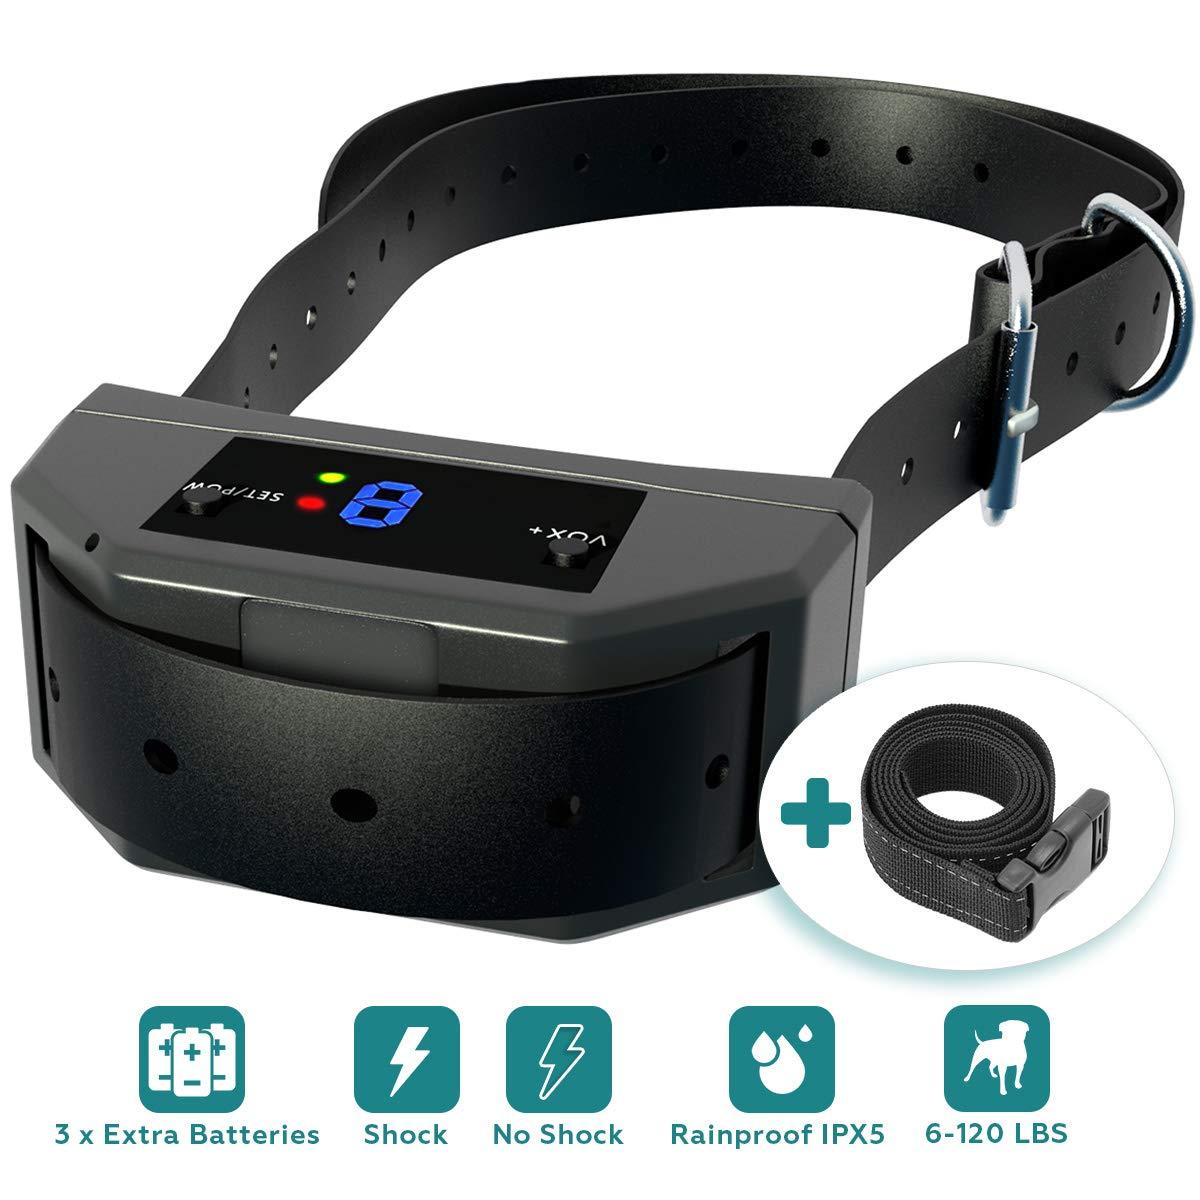 TBI Pro [Newest 2018 Upgraded] Bark Collar w/Upgraded Smart Chip - Best Dog Anti-Barking Collar, Beep/Shock Mode. No Bark Device